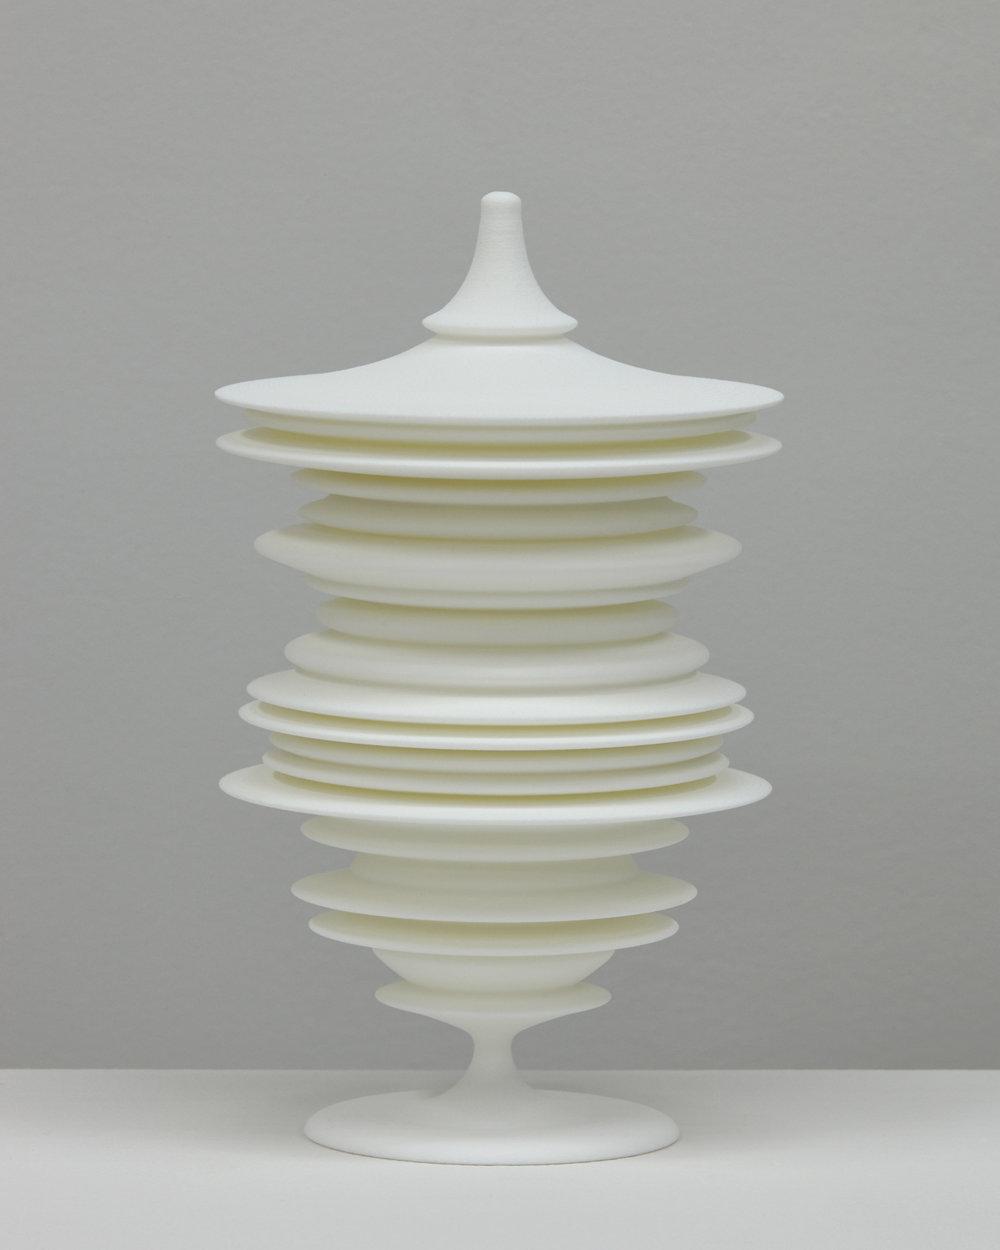 "Laura Splan, ""Manifest (Squint),"" 2015, Laser sintered polyamide nylon, 8 x 4.75 x 4.75 inches, edition of 5 plus one artist proof"